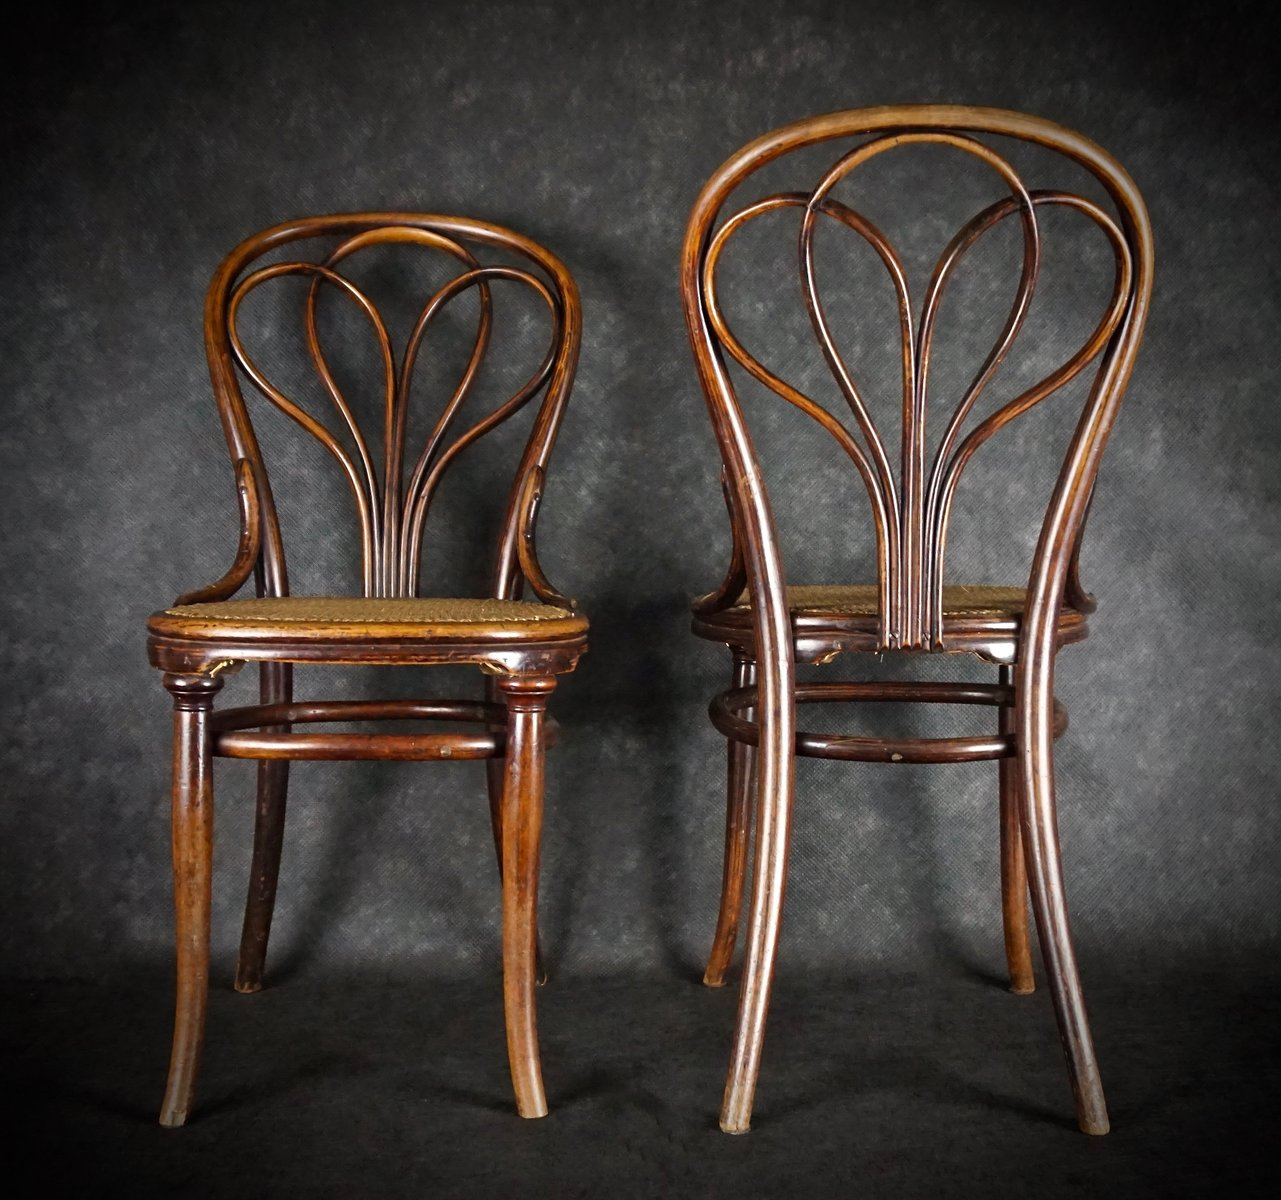 antike no 25 st hle von michael thonet f r gebr der. Black Bedroom Furniture Sets. Home Design Ideas